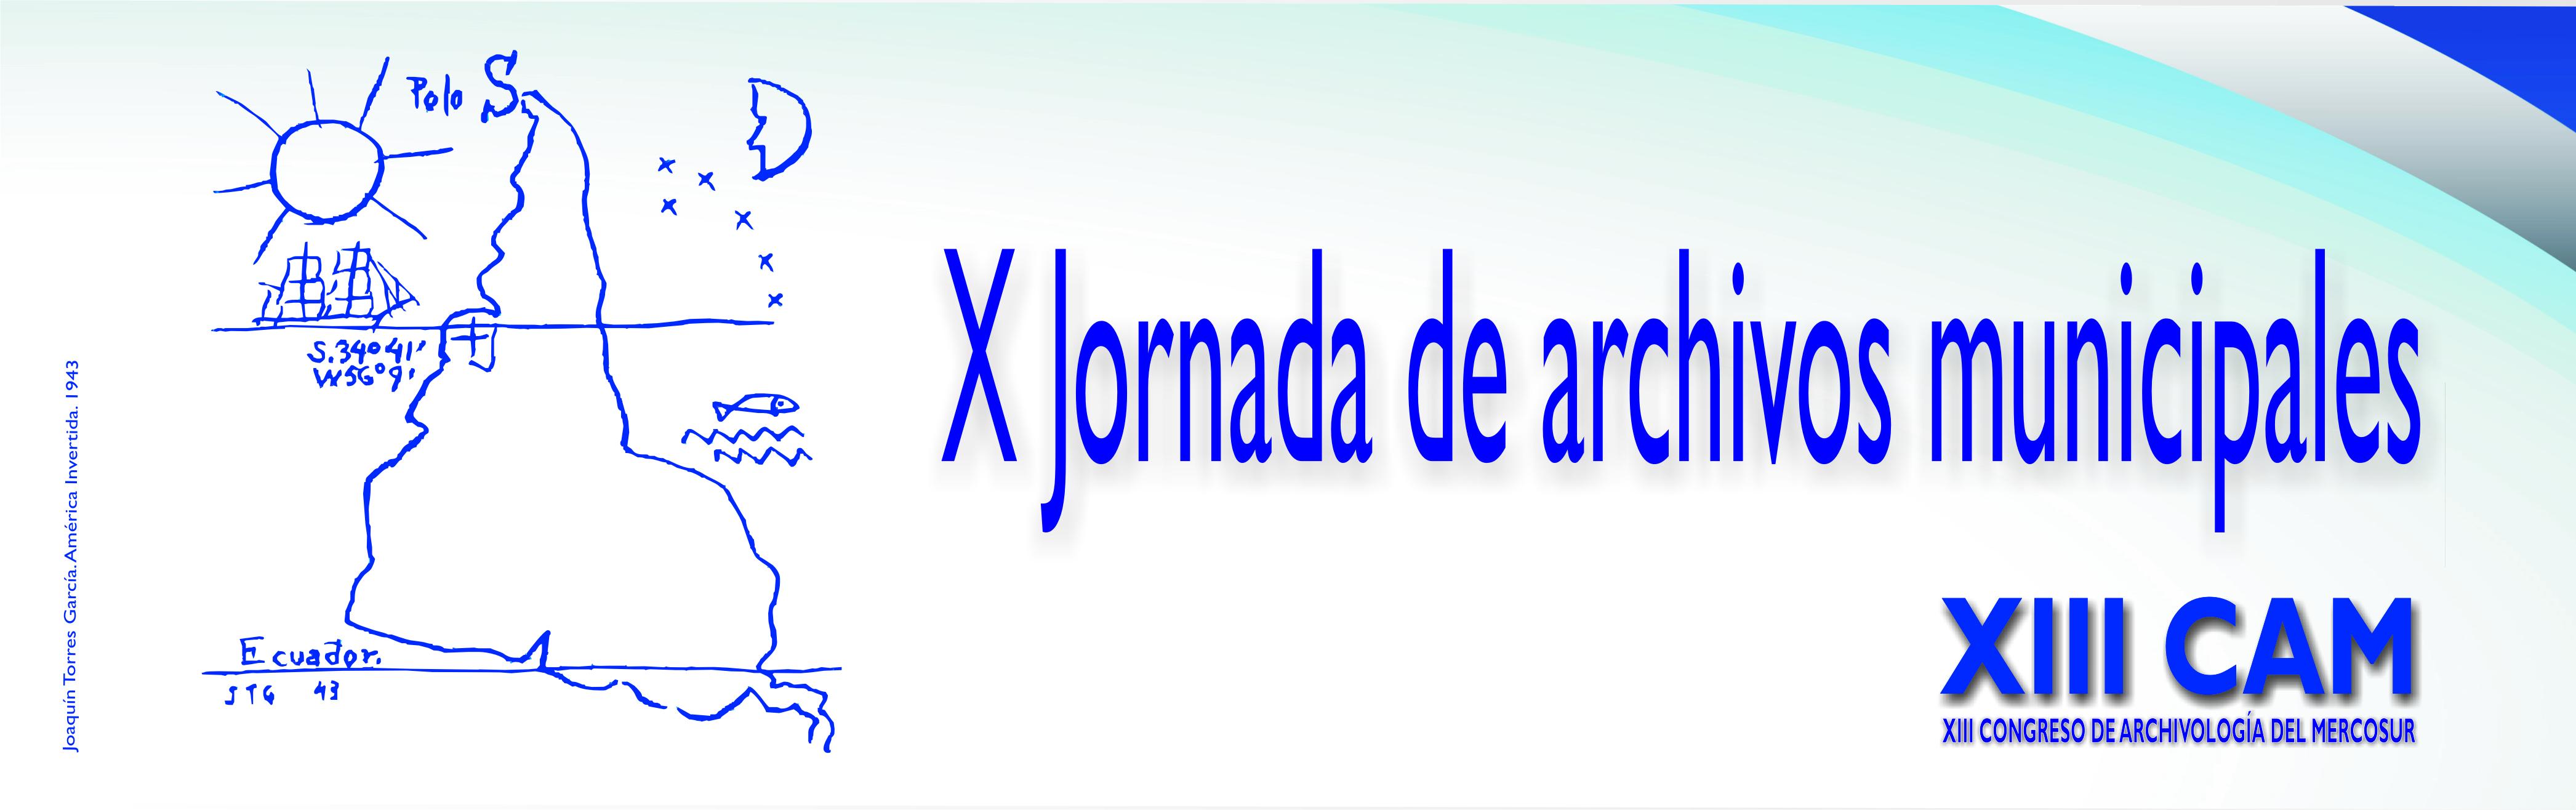 X Jornada de archivos municipales